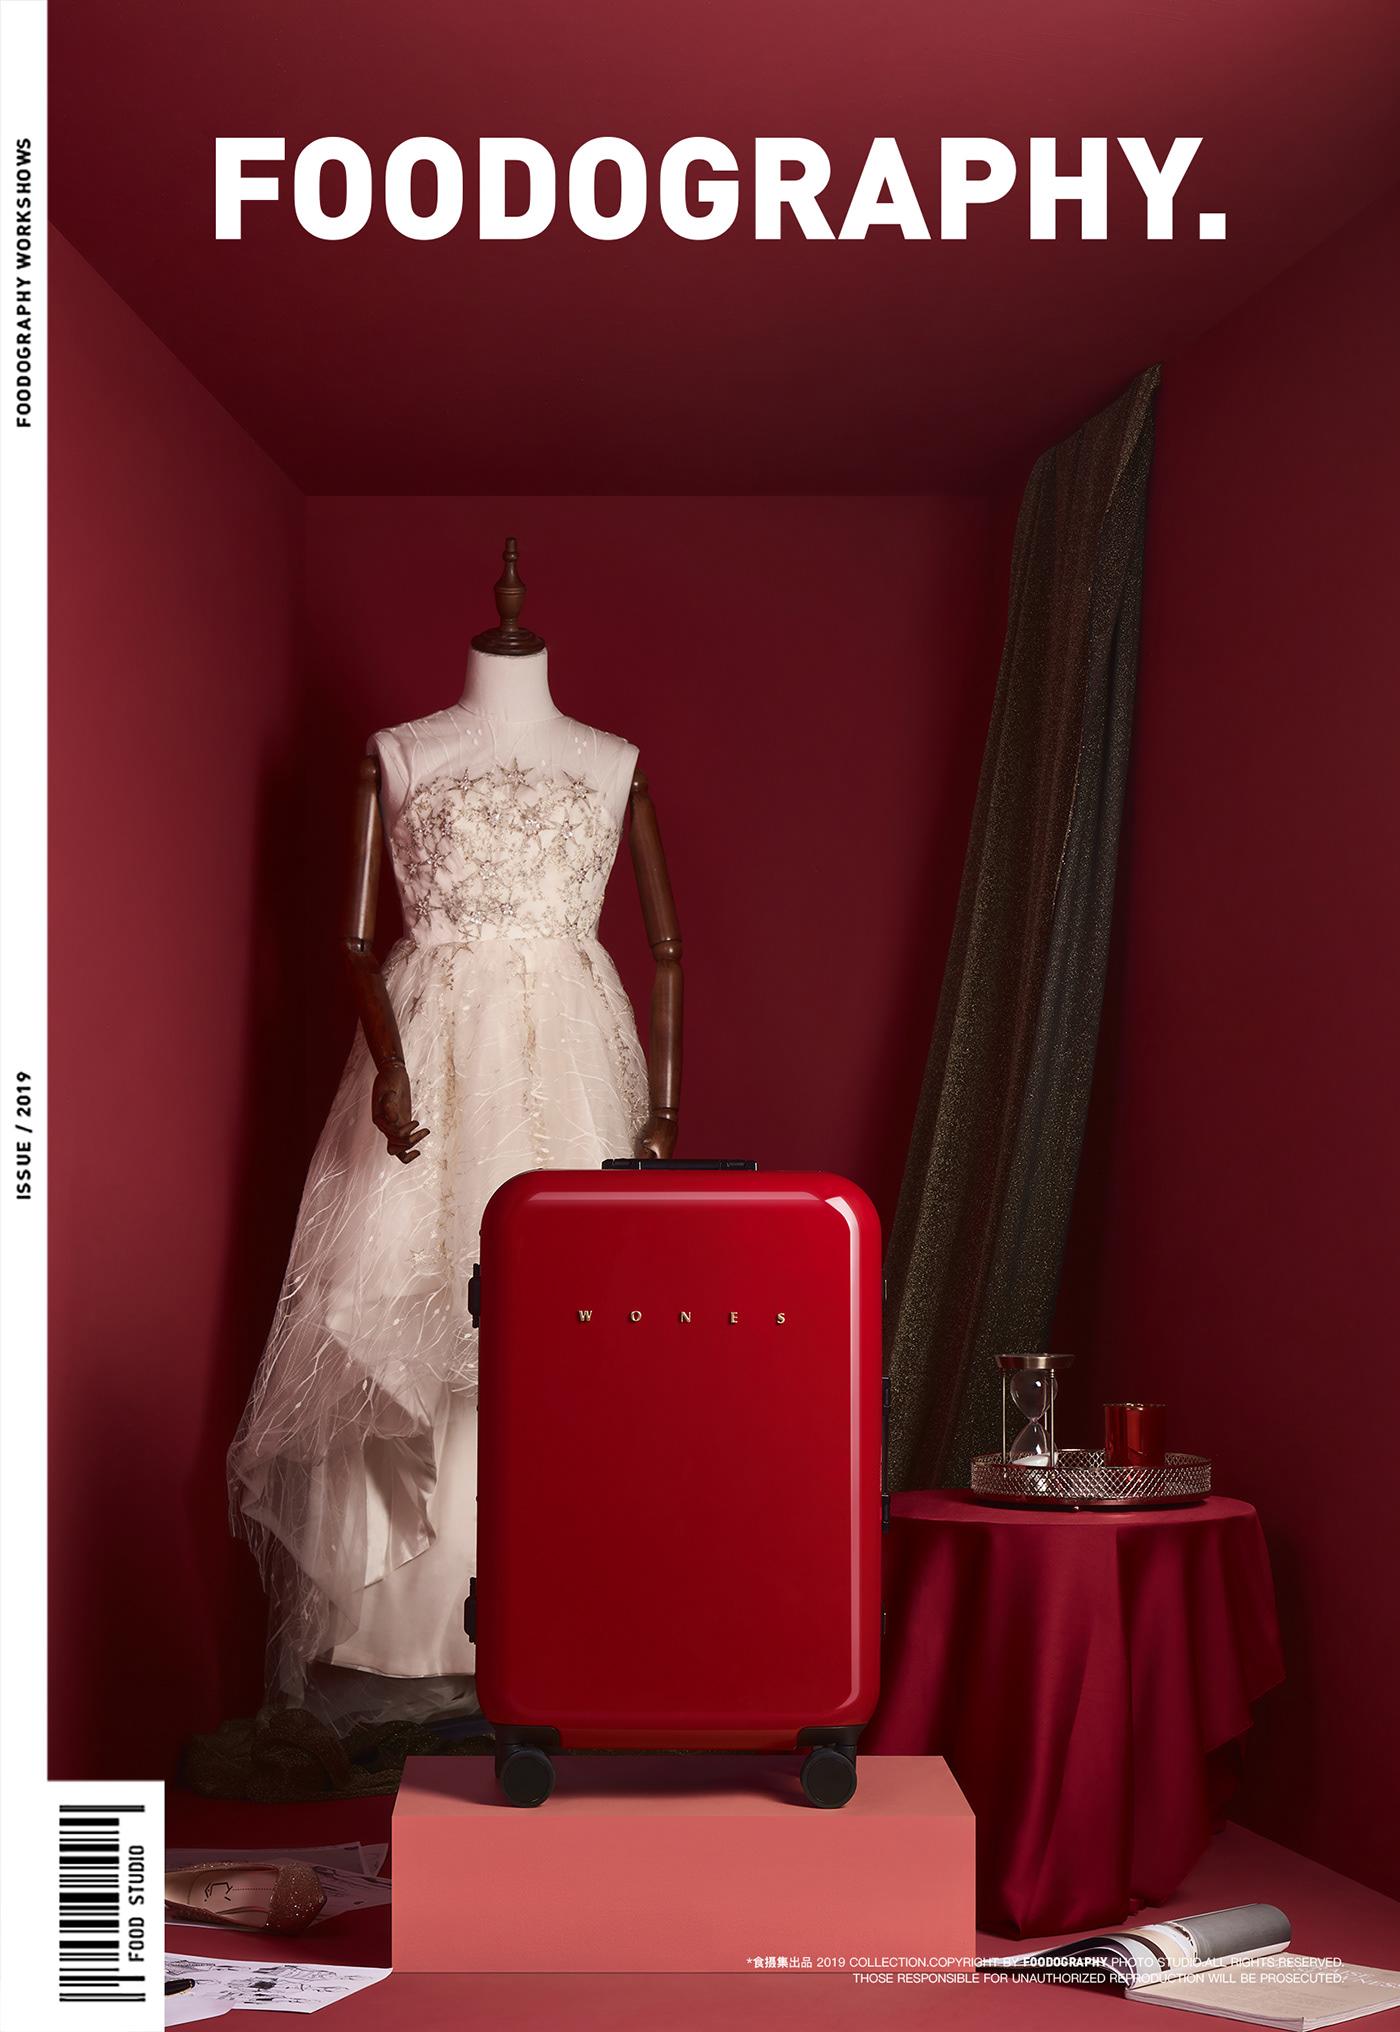 Image may contain: dress, wedding dress and wall